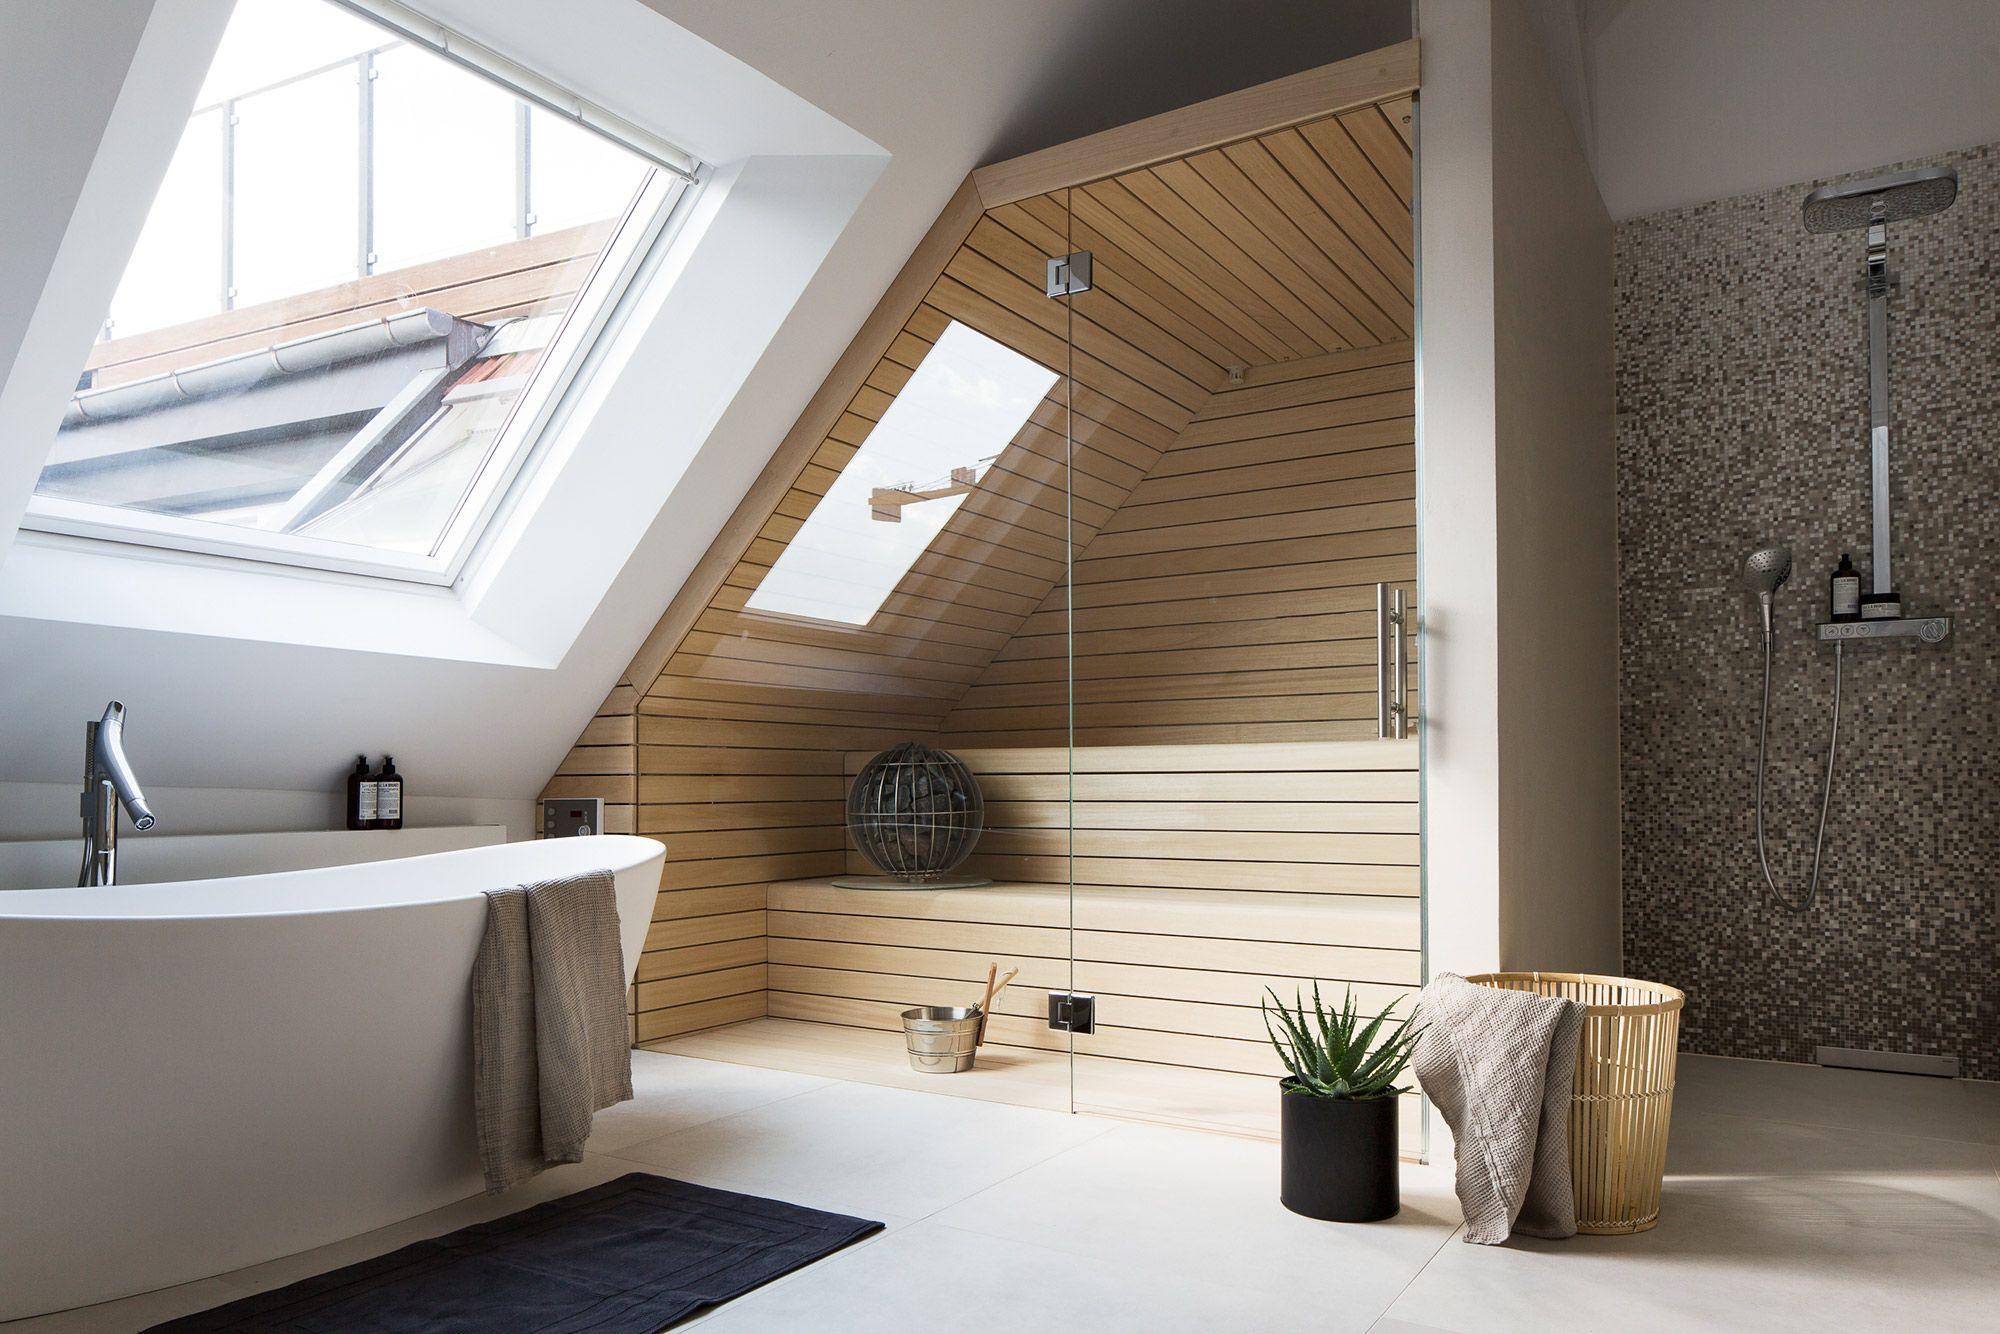 Une salle de bain sous pente ou sous bles en 52 photos